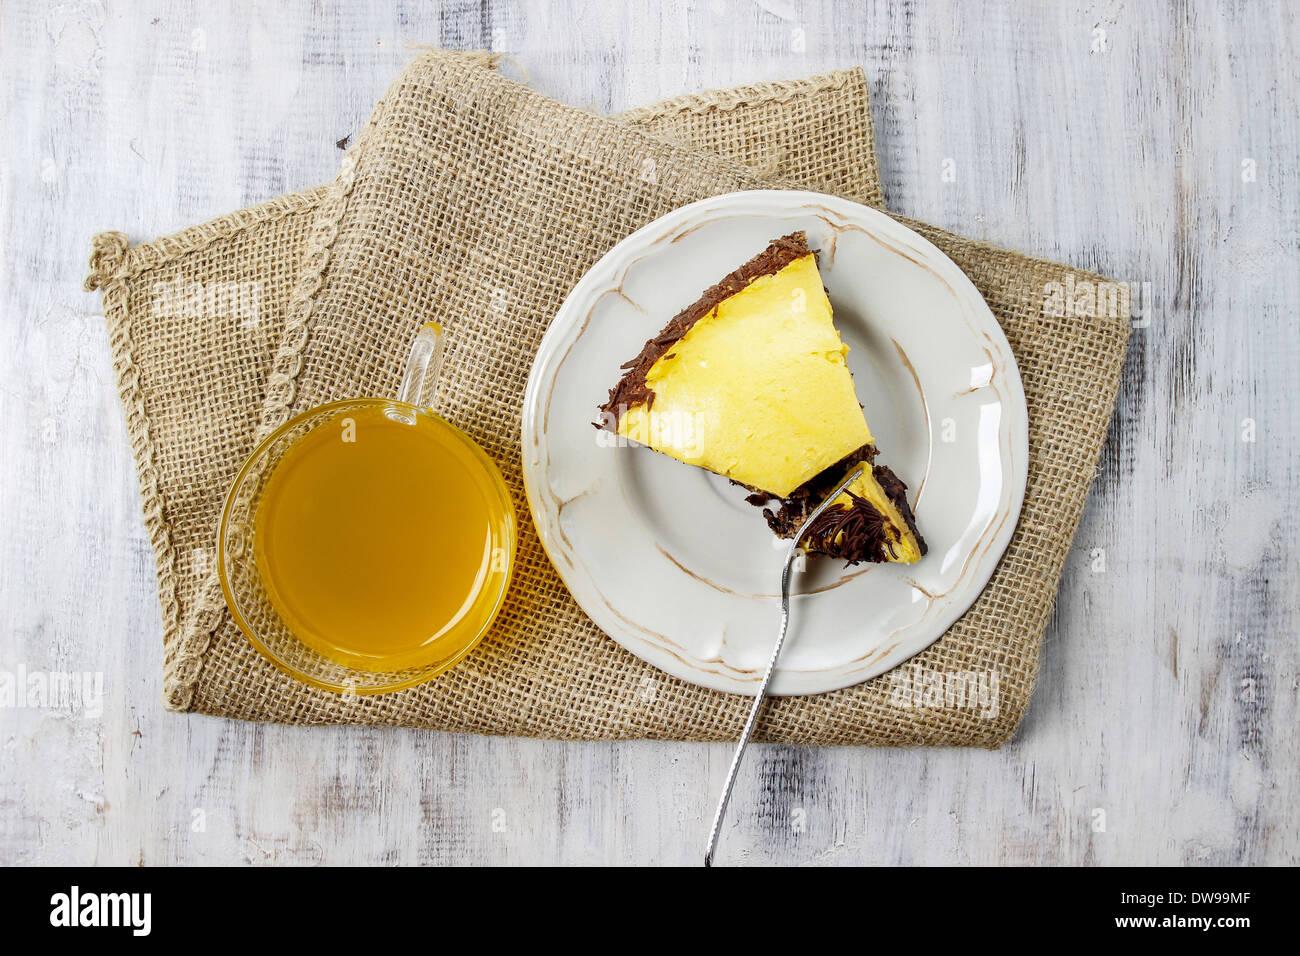 Birthday Party Table Setting Vanilla And Chocolate Layer CakeBirthday Cake